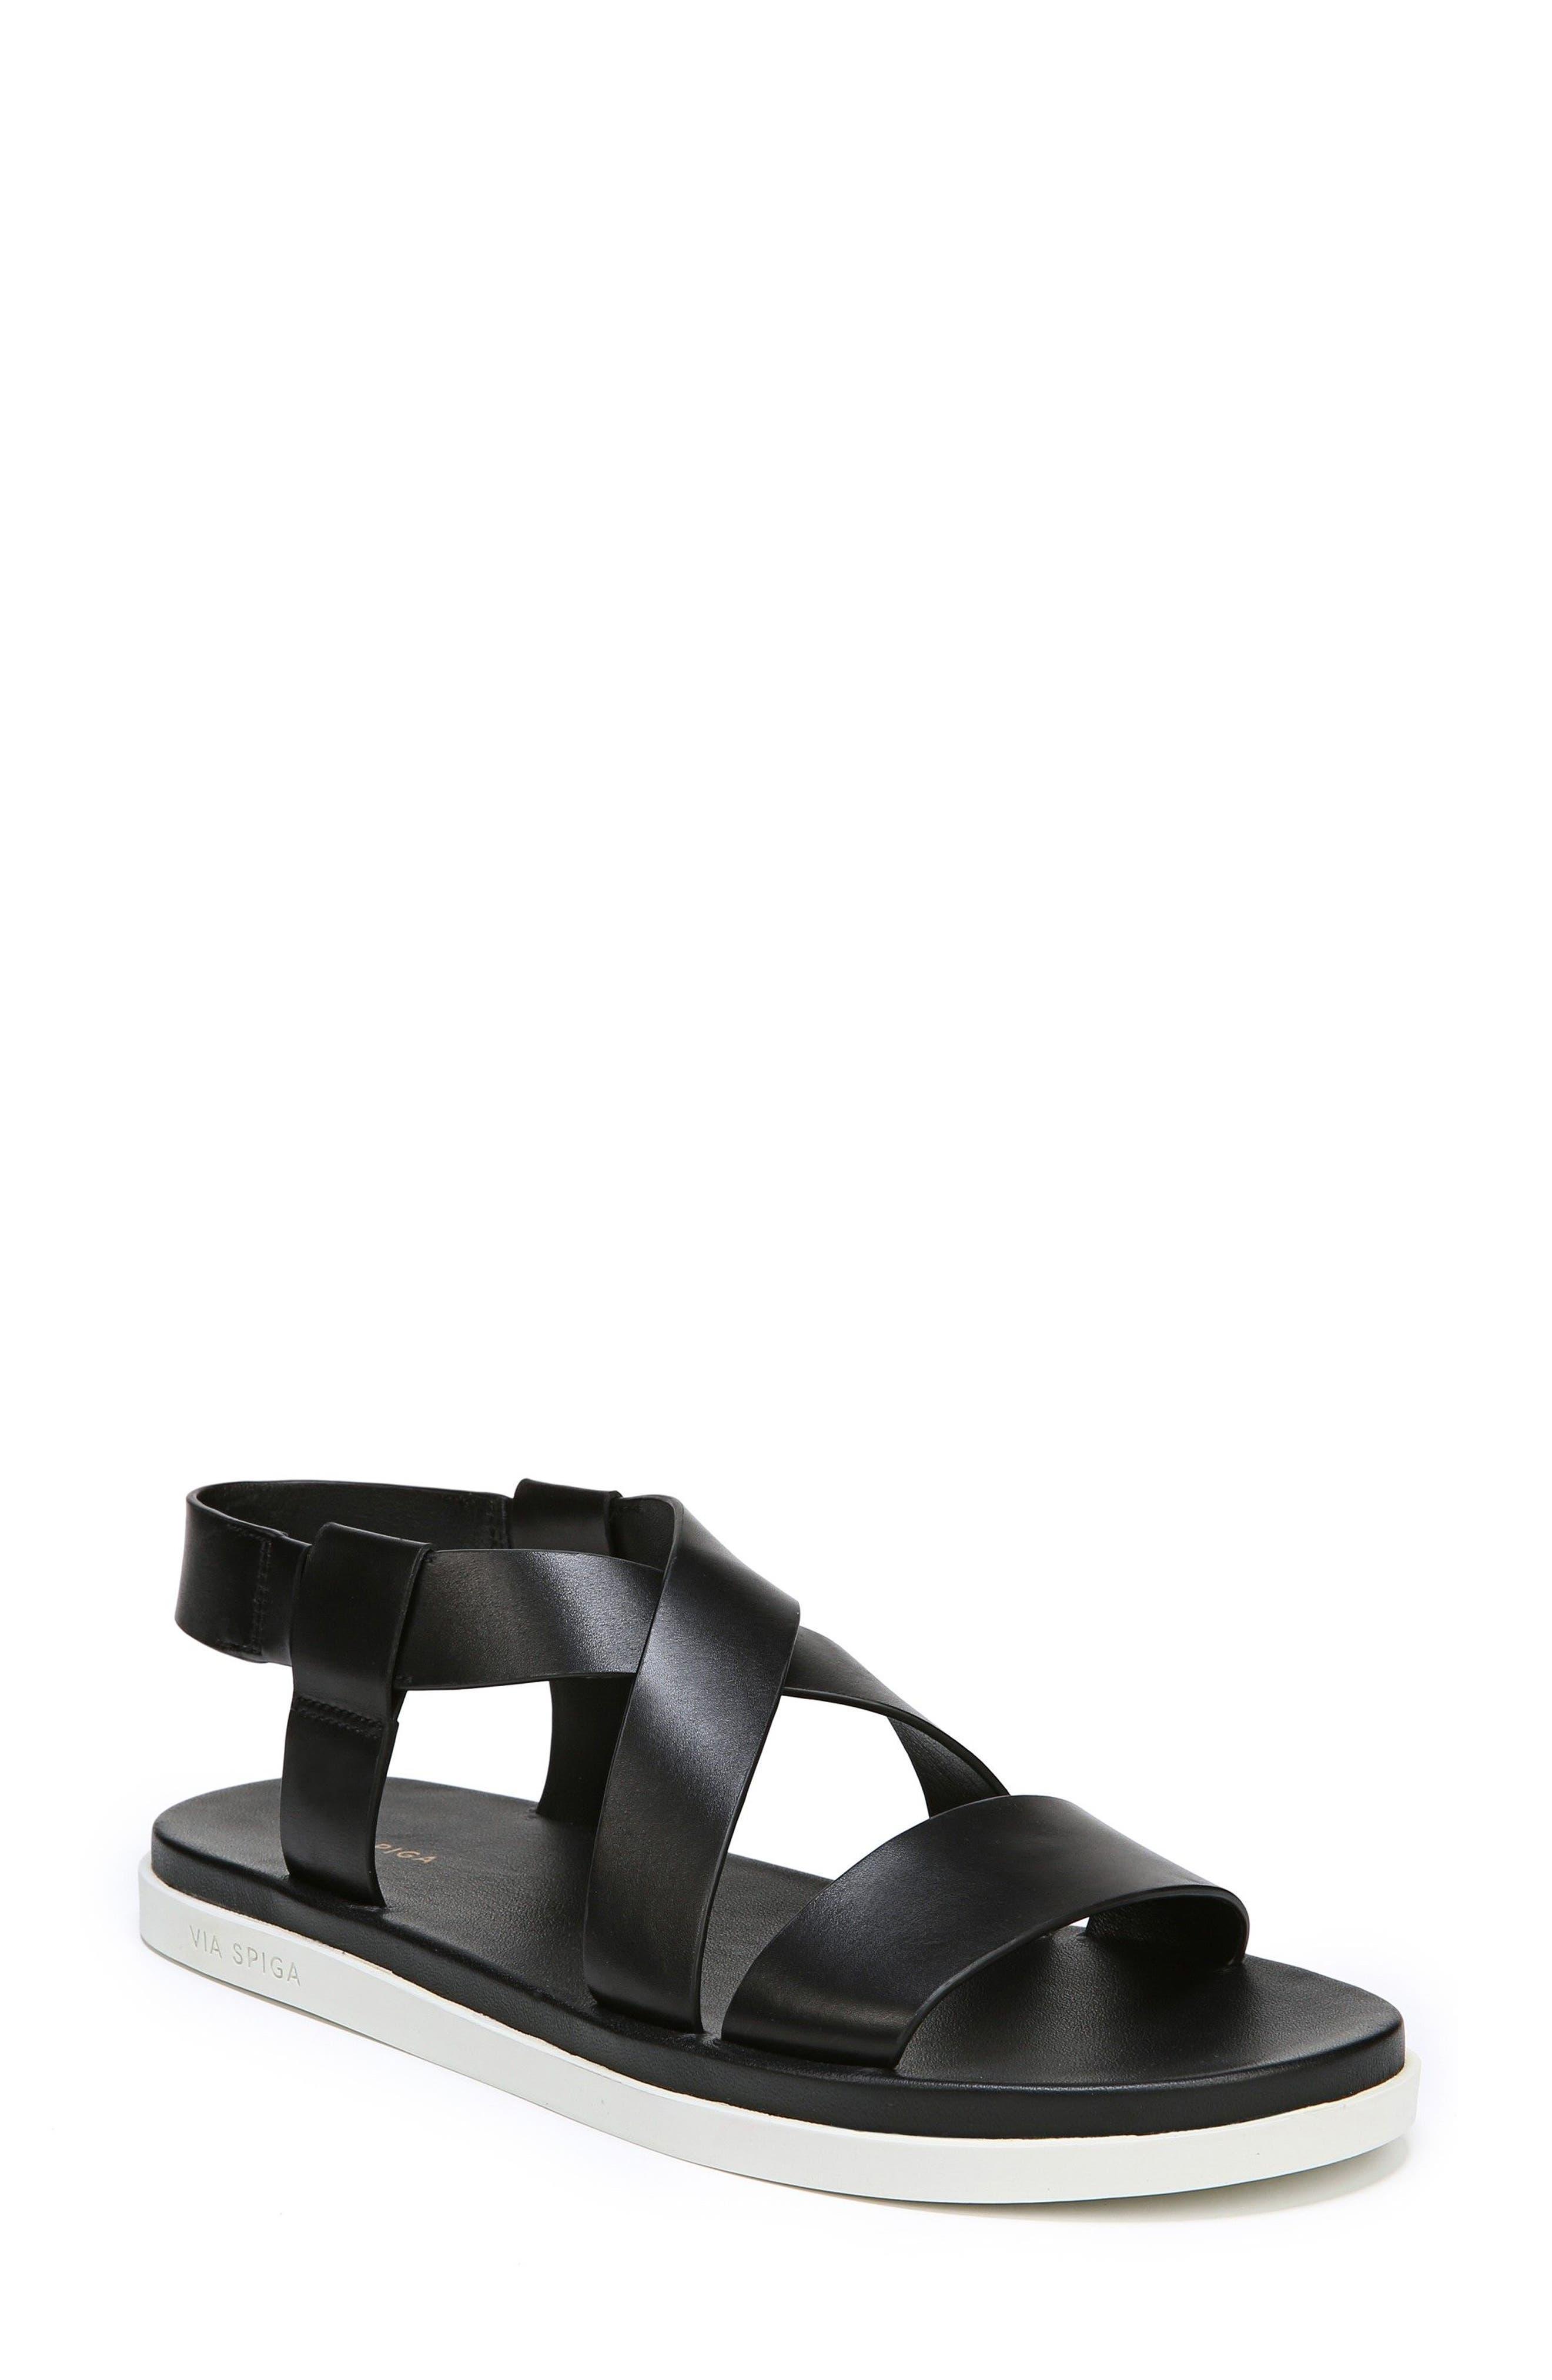 Kalia Strappy Sandal,                         Main,                         color, 001